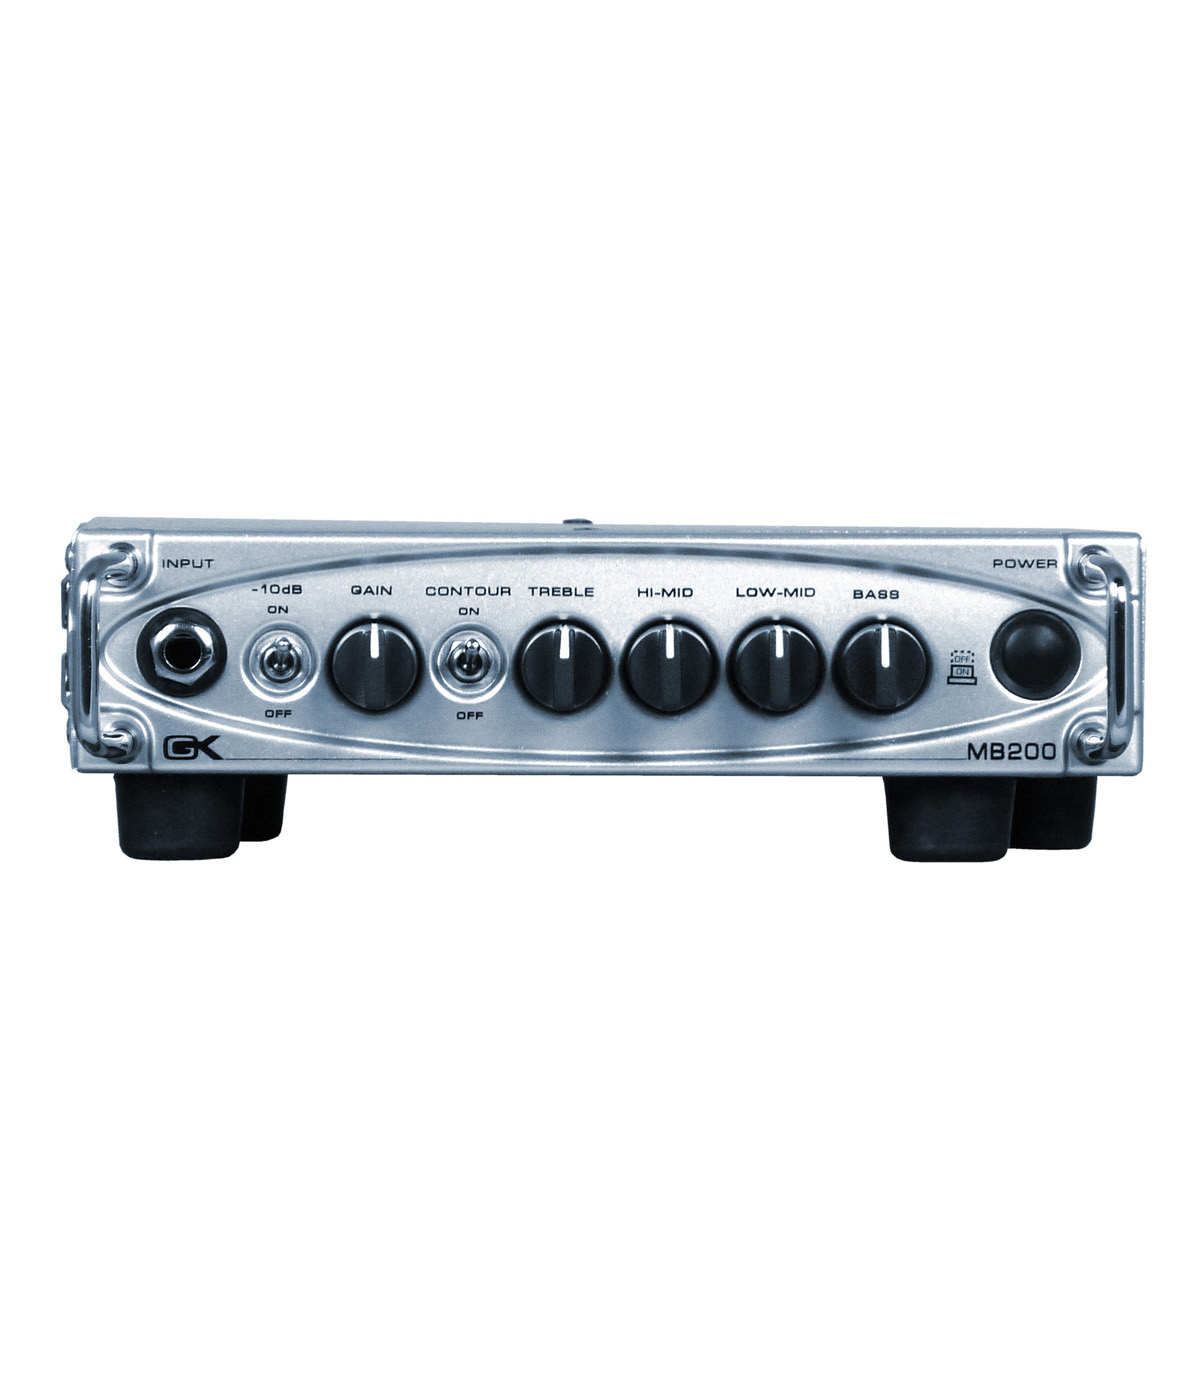 buy gk mb 200 watt ultra light solid state bass head